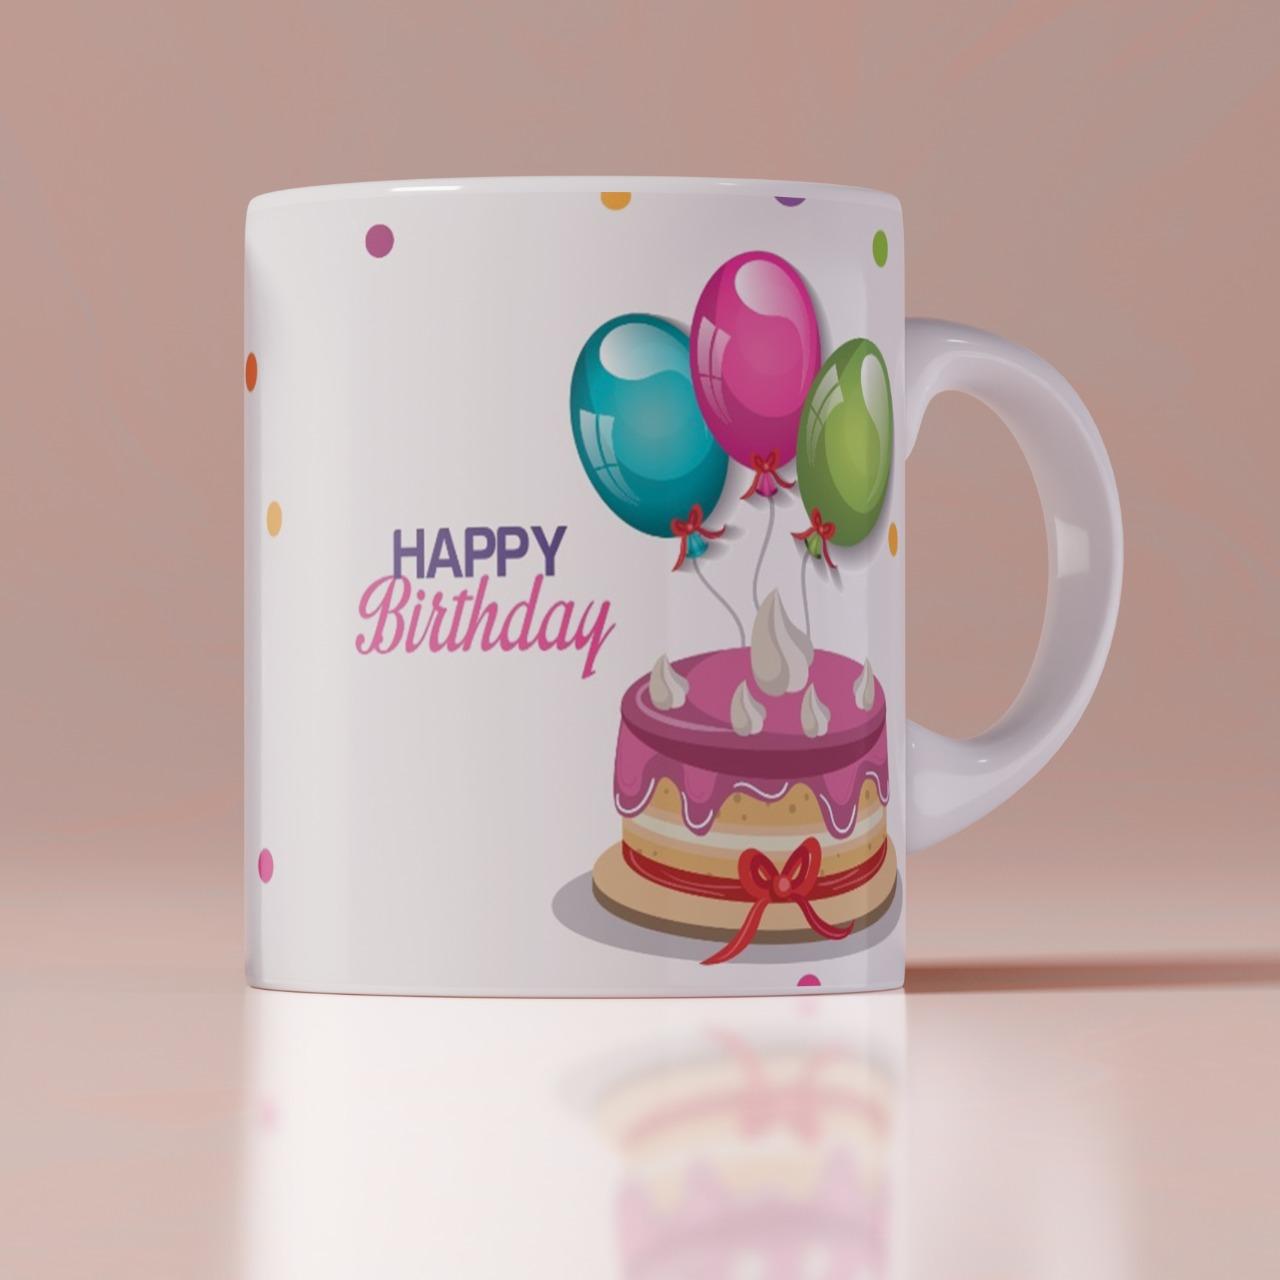 Birthday Customized Coffee Mug